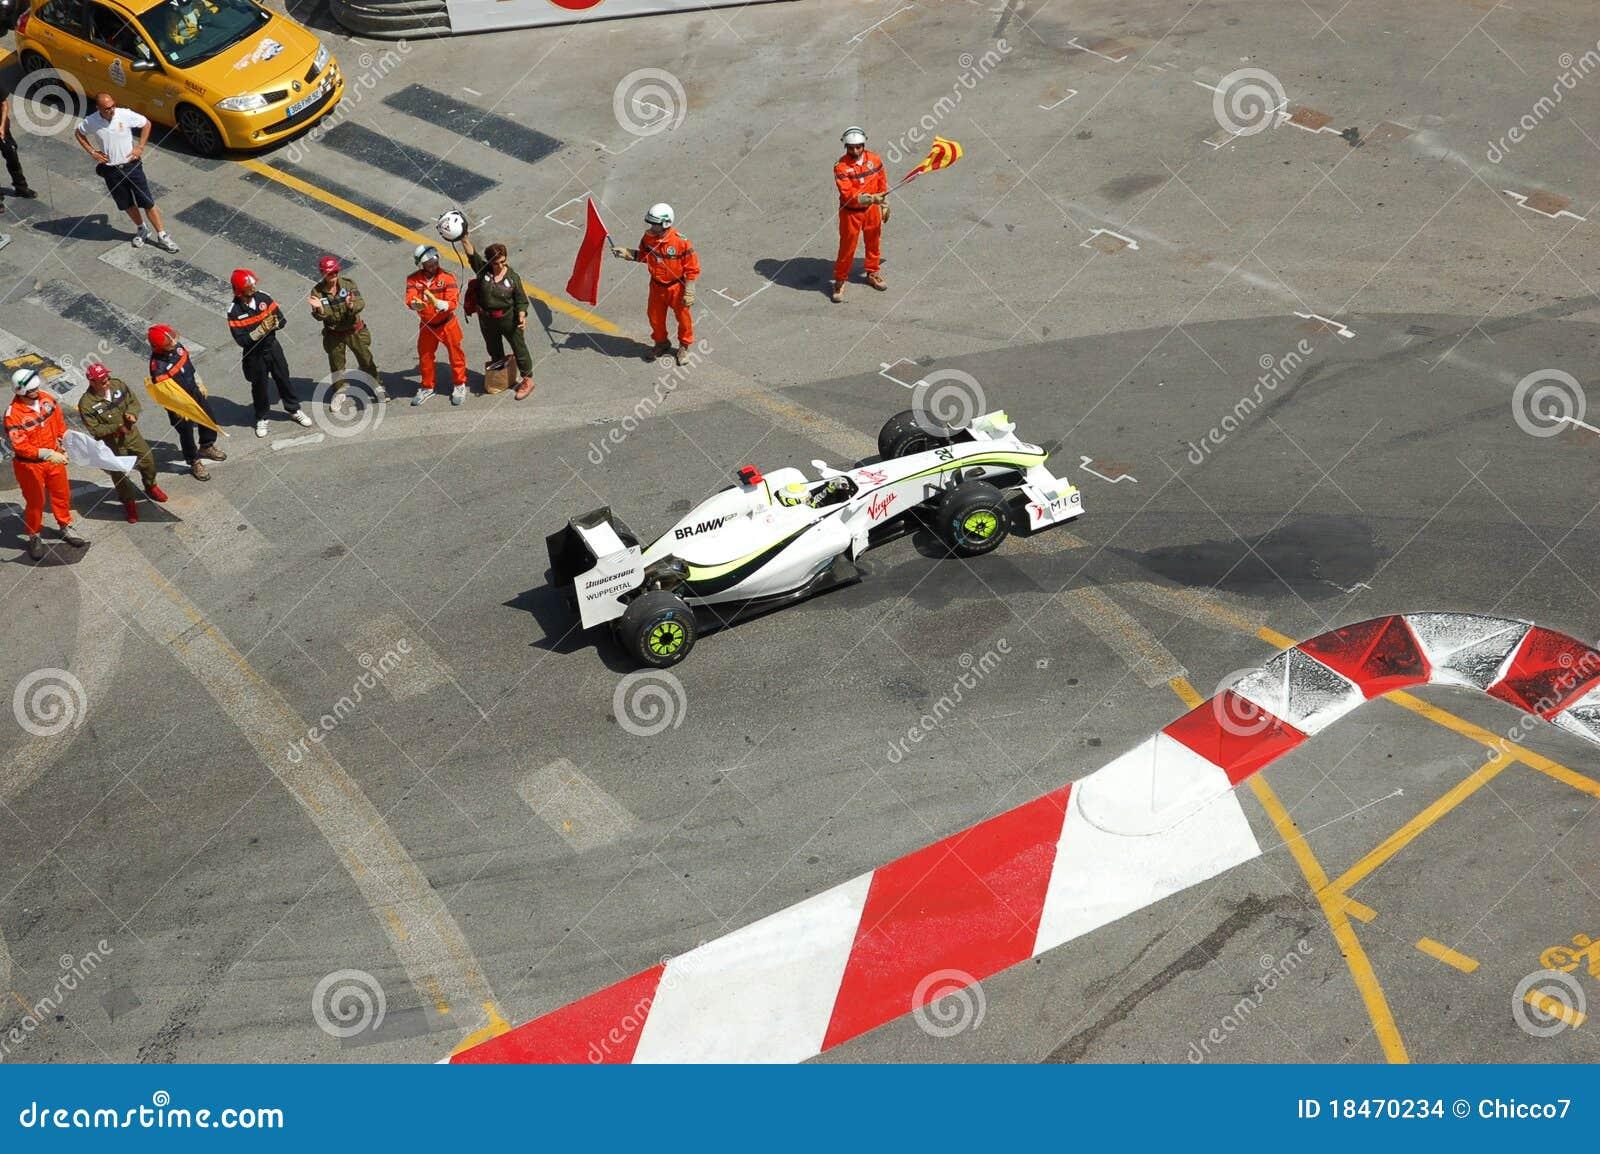 Prix grande Monaco 2009, Brawn de Jenson Button